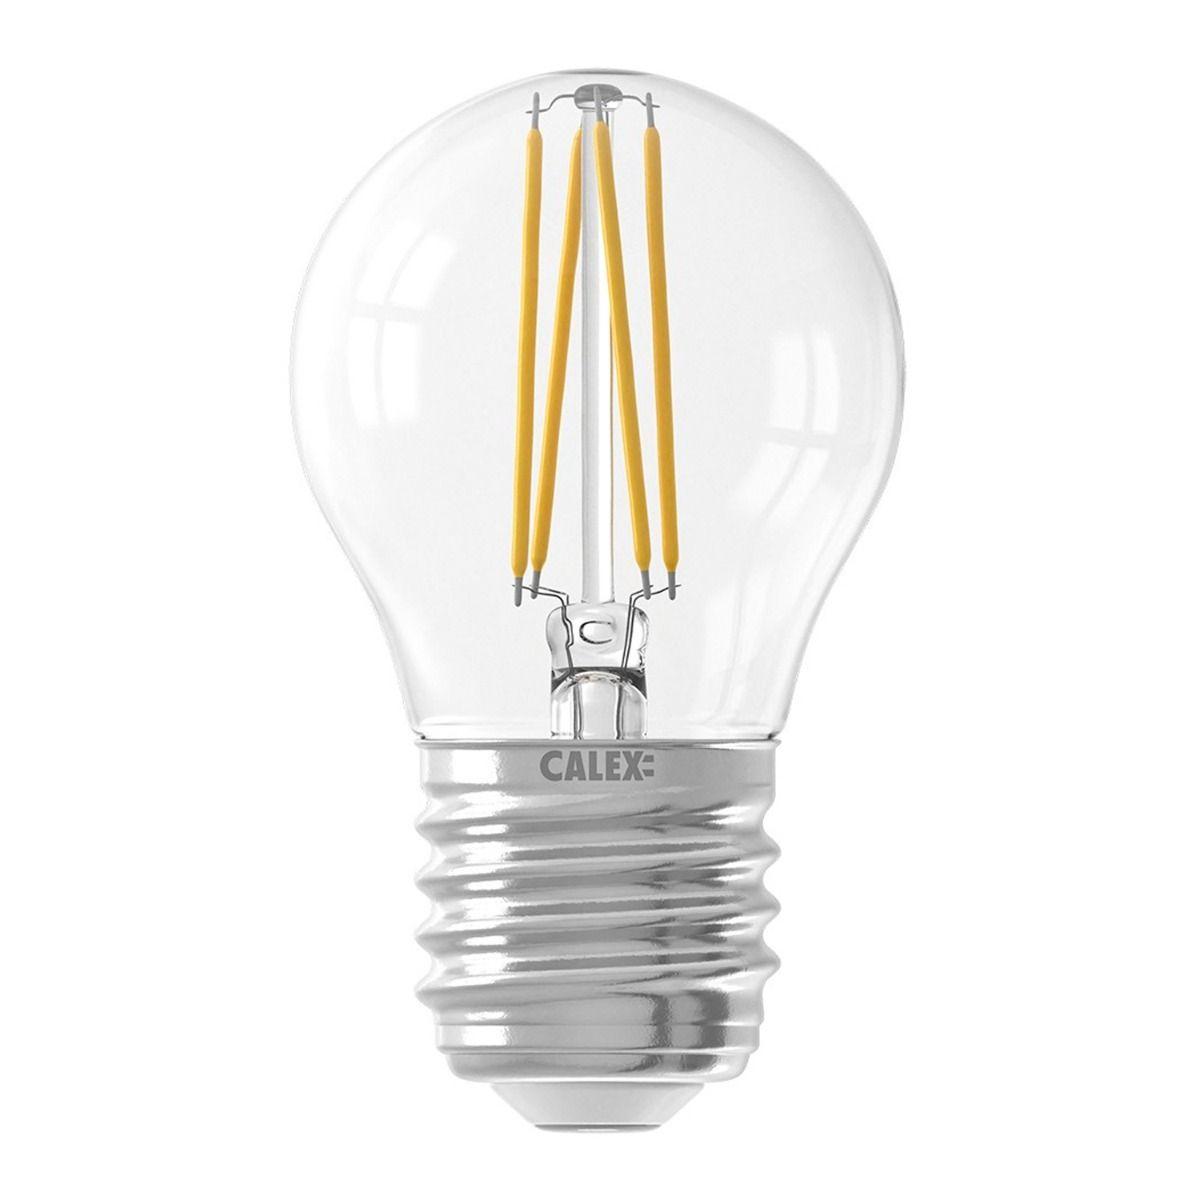 Calex Smart Kogelvormig LED Lamp E27 4,5W 450lm 1800-3000K Filament   Tuya Wifi - Afstembaar Wit